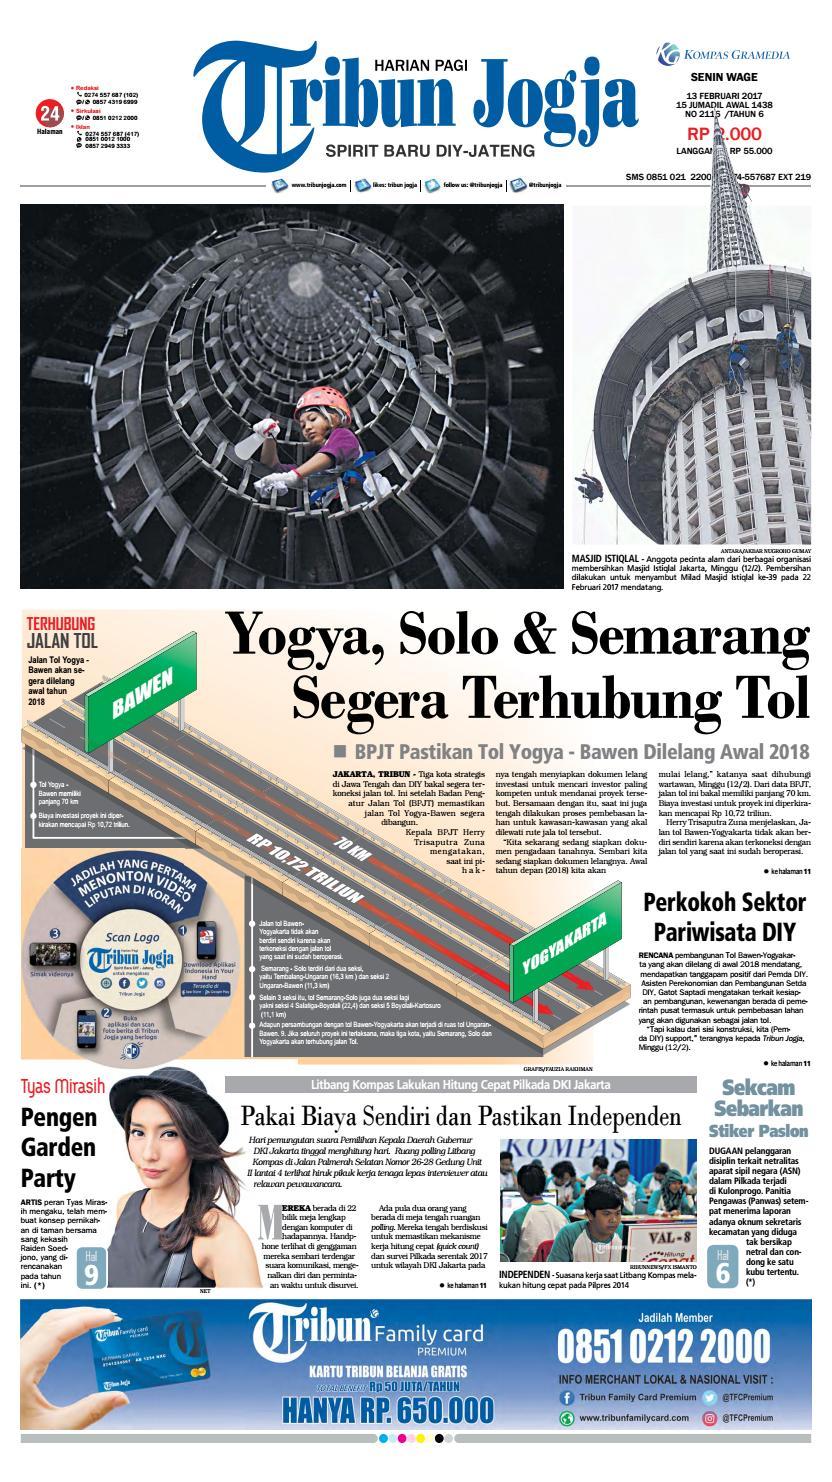 Tribunjogja 13 02 2017 By Tribun Jogja Issuu Produk Ukm Bumn Wisata Mewah Bali 3hr 2mlm